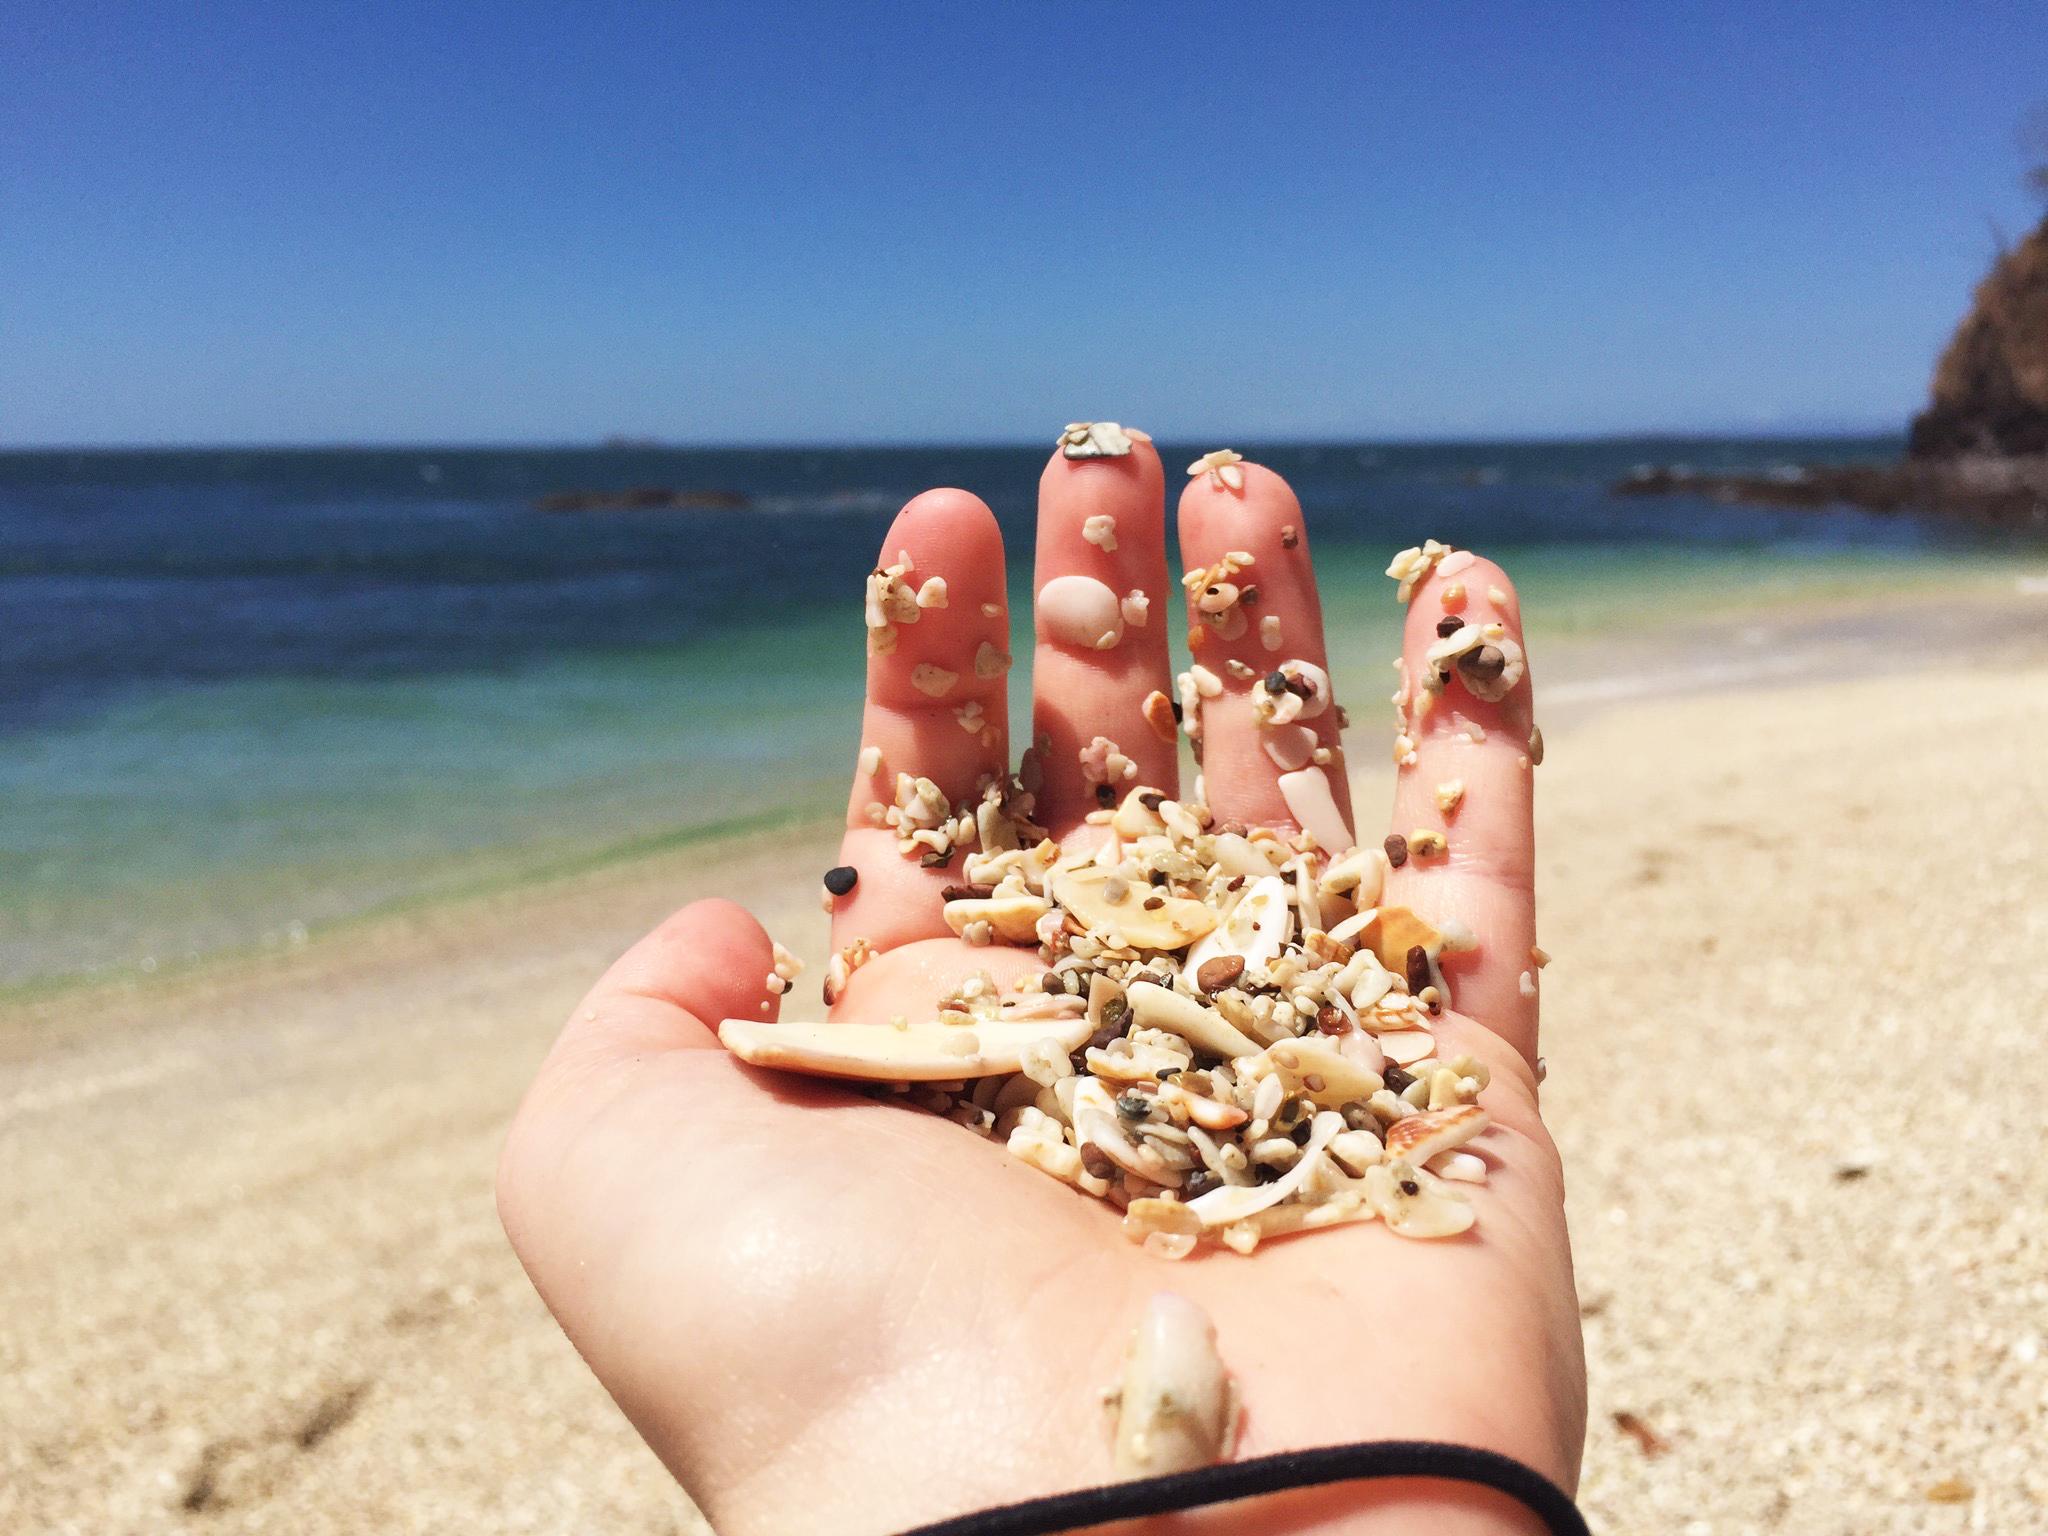 Tiny crushed shells